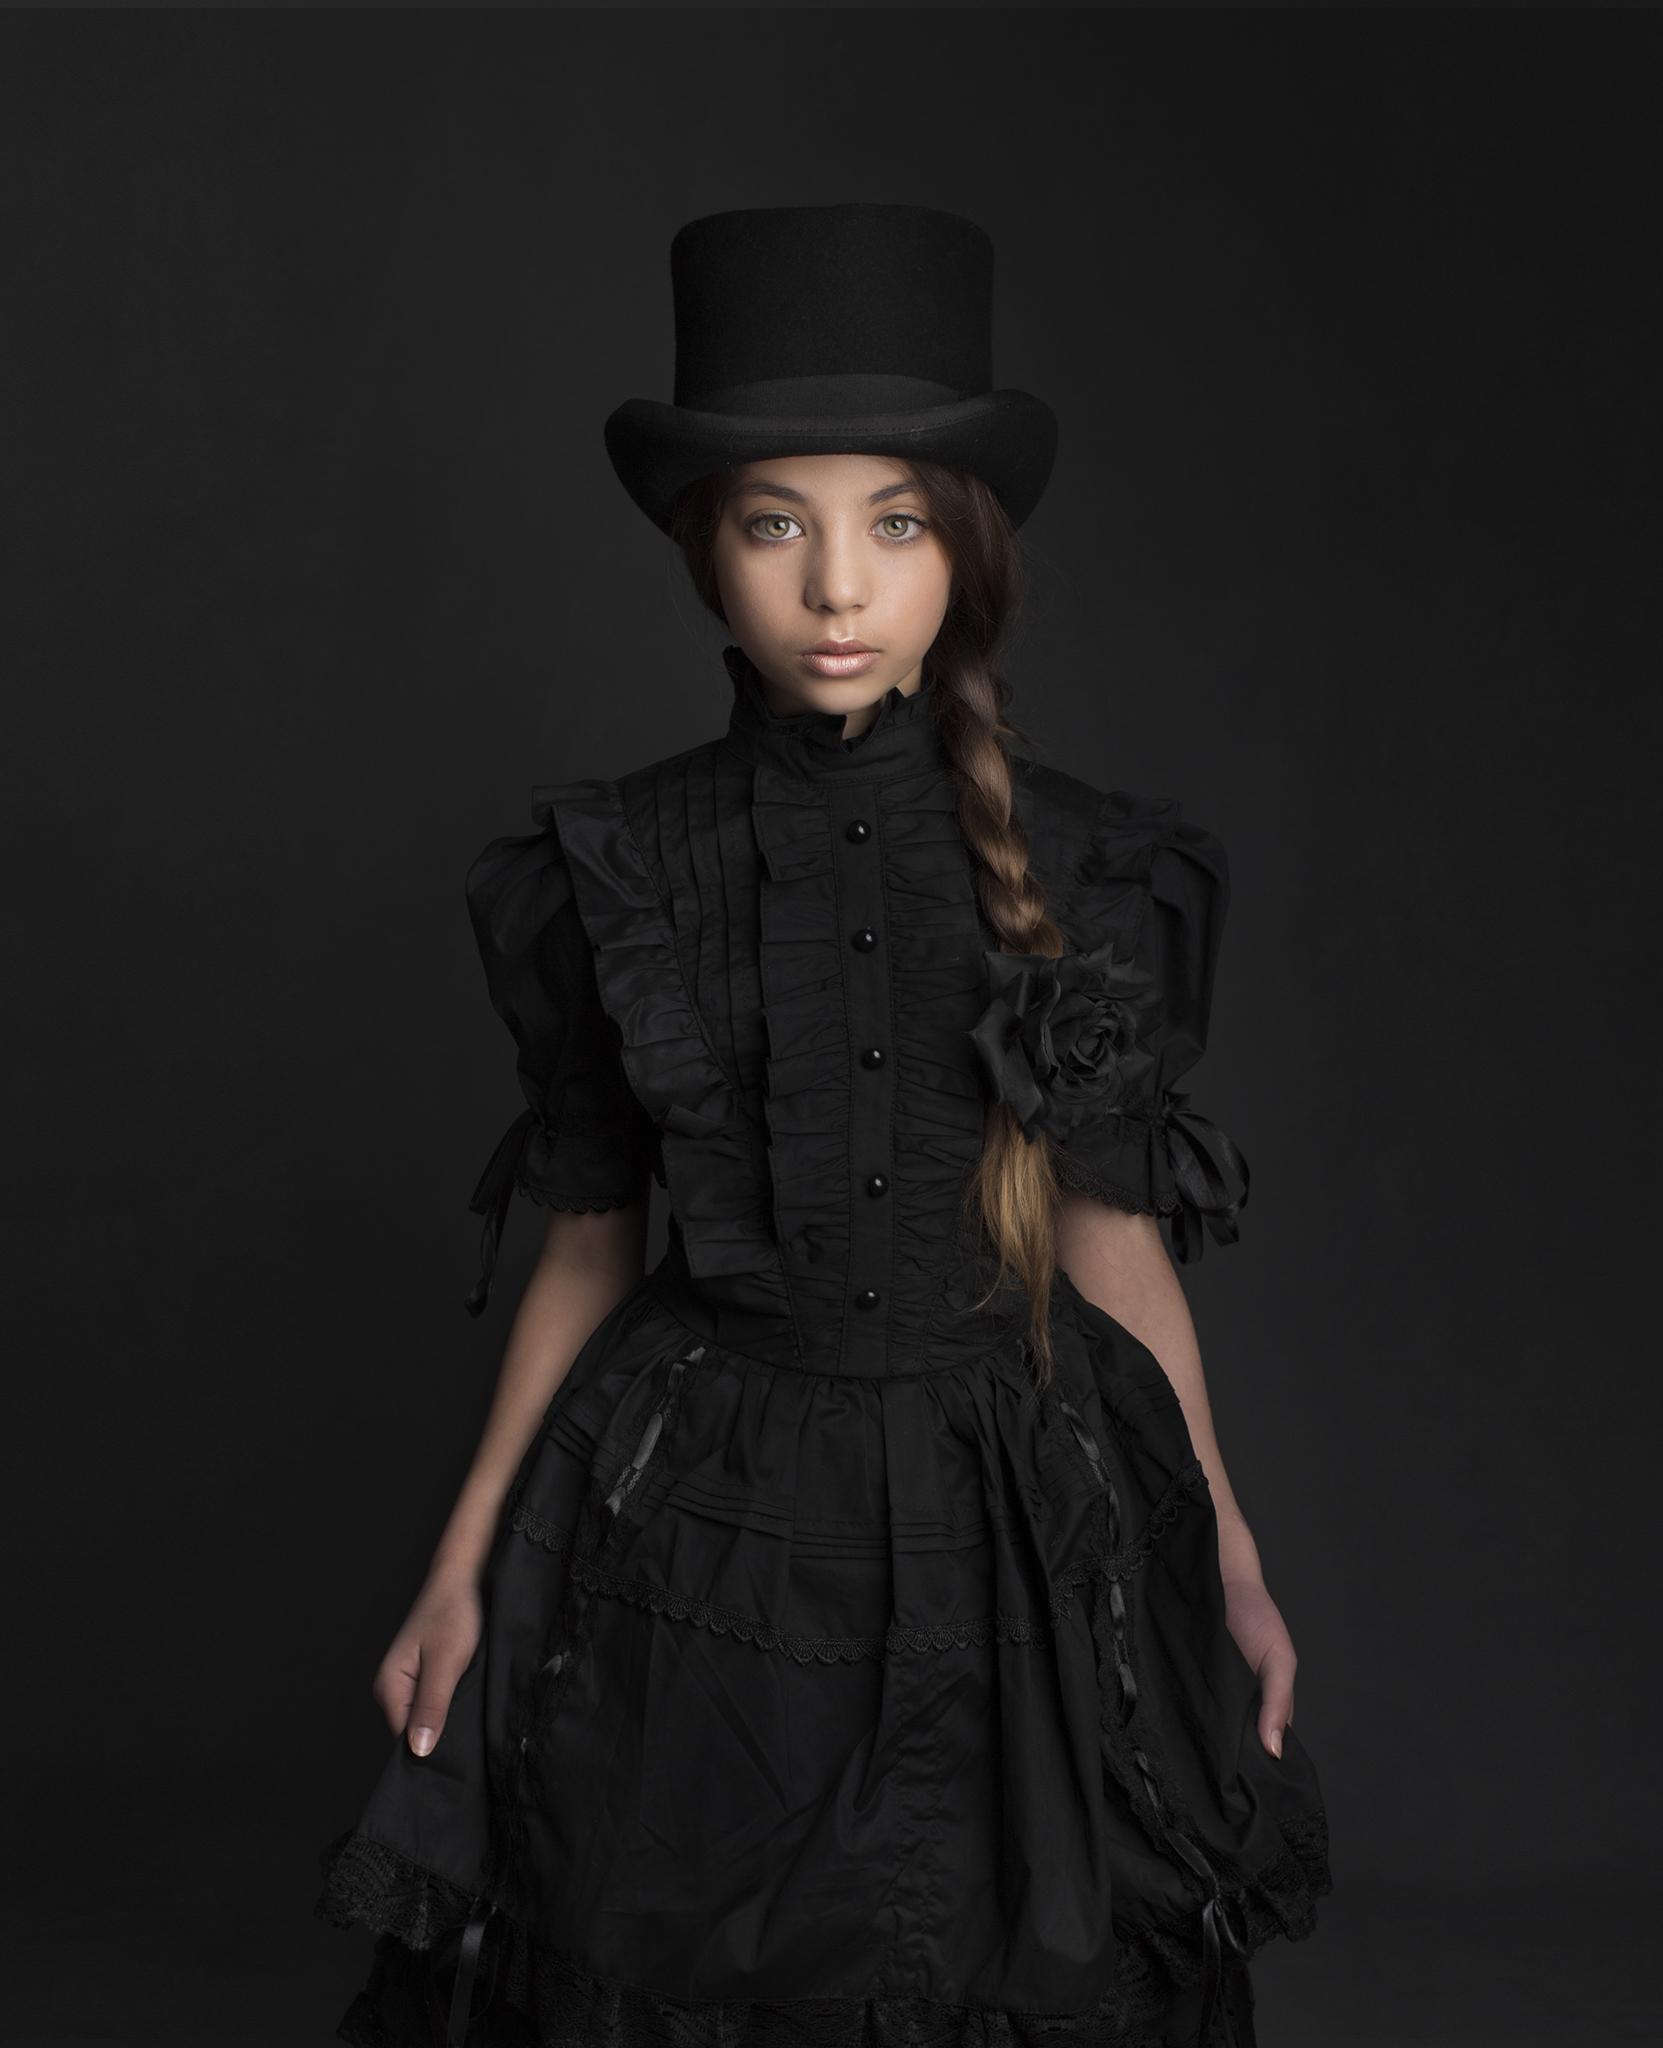 elizabethgphotography_fineart_kingslangley_hertfordshire_child_model_dancer_elysia_3.jpg